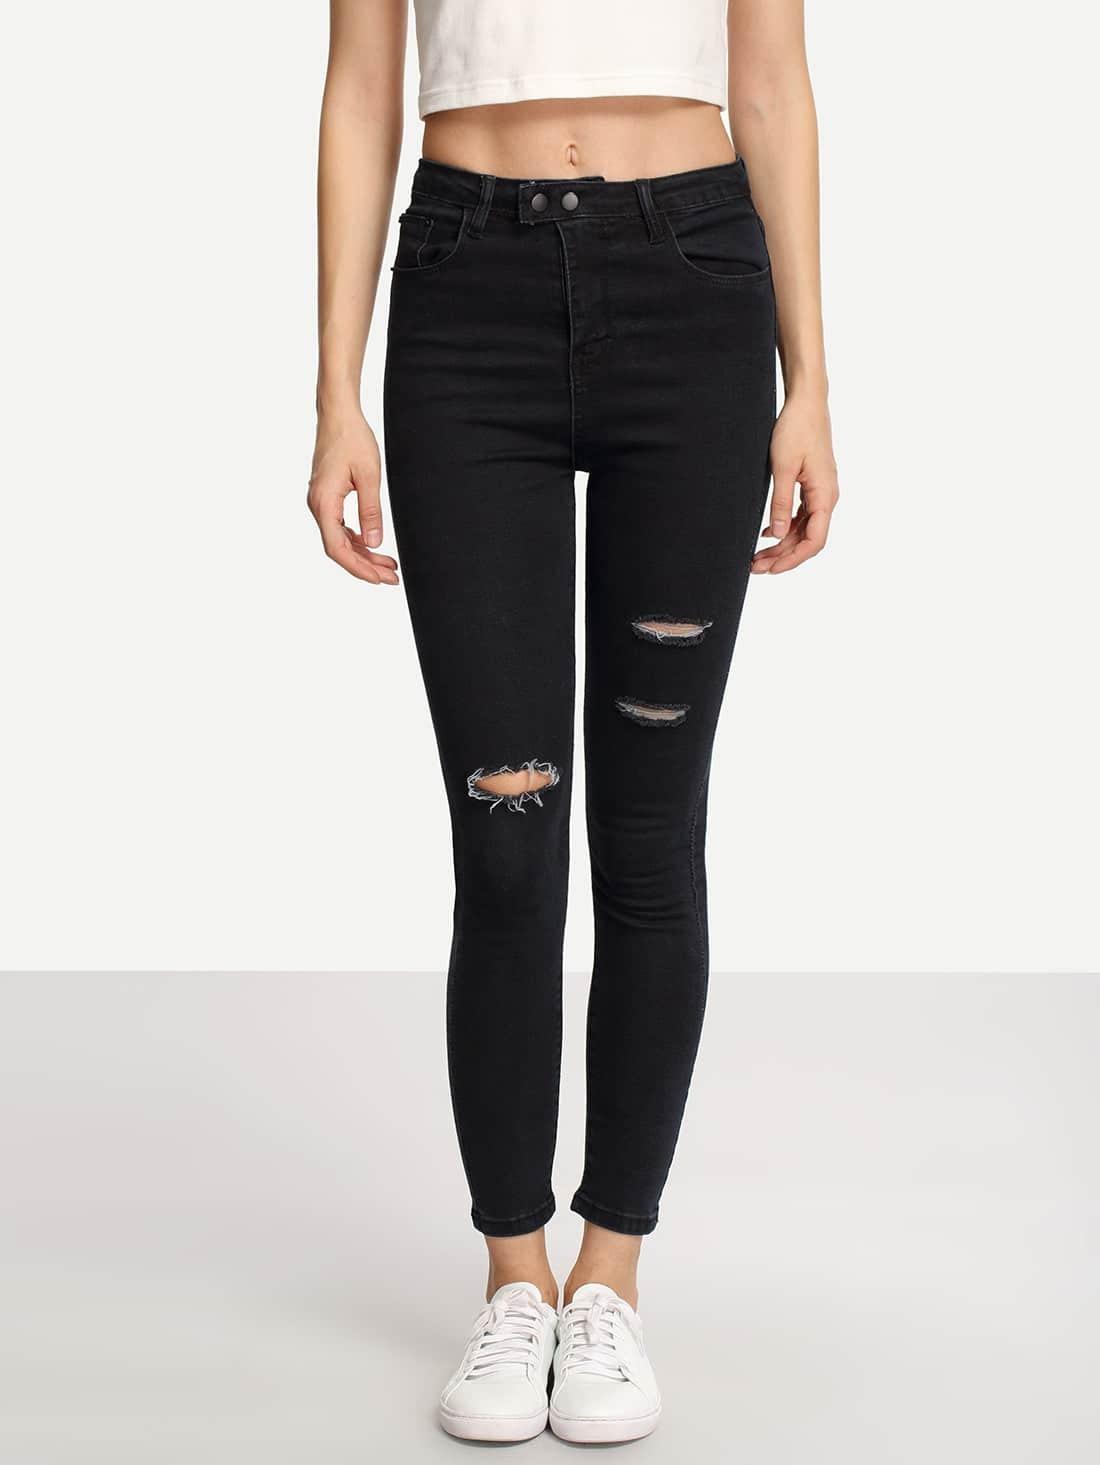 Ripped Black Skinny Jeans -SheIn(Sheinside)